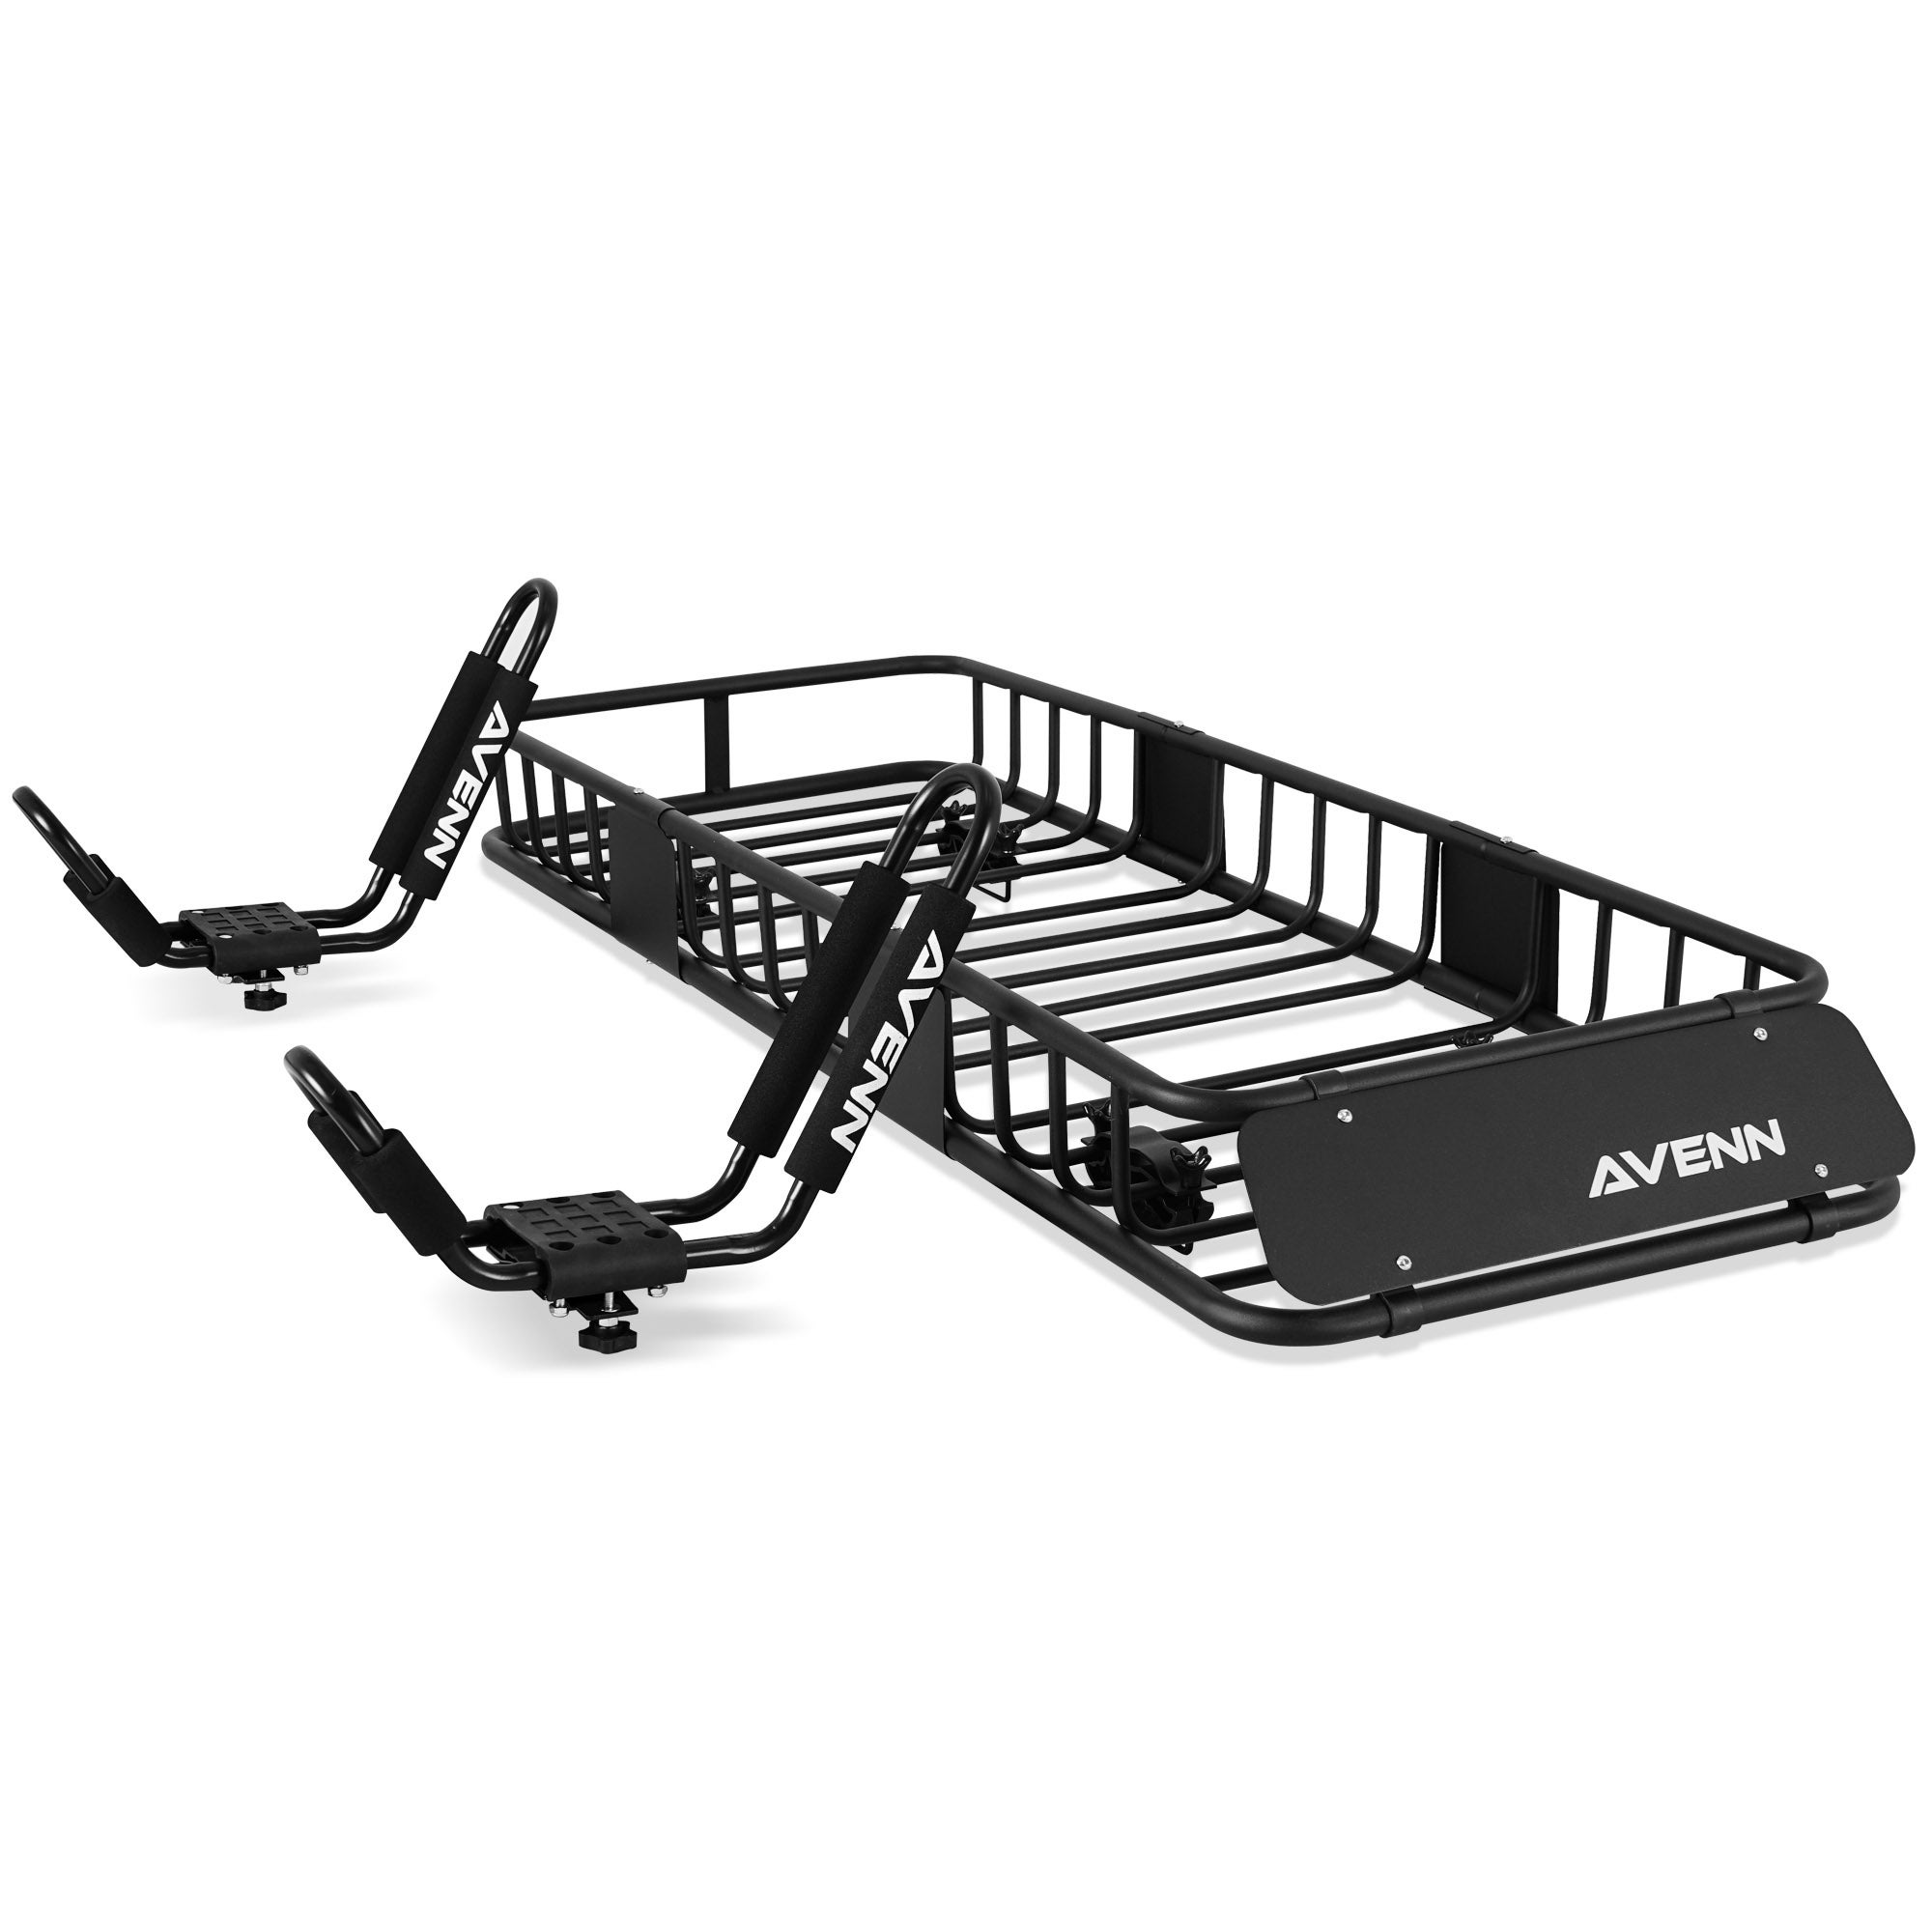 "AVENN 8"" x 8"" x 8"" Cargo Basket Roof Rack & J-Bar Rack Carrier"